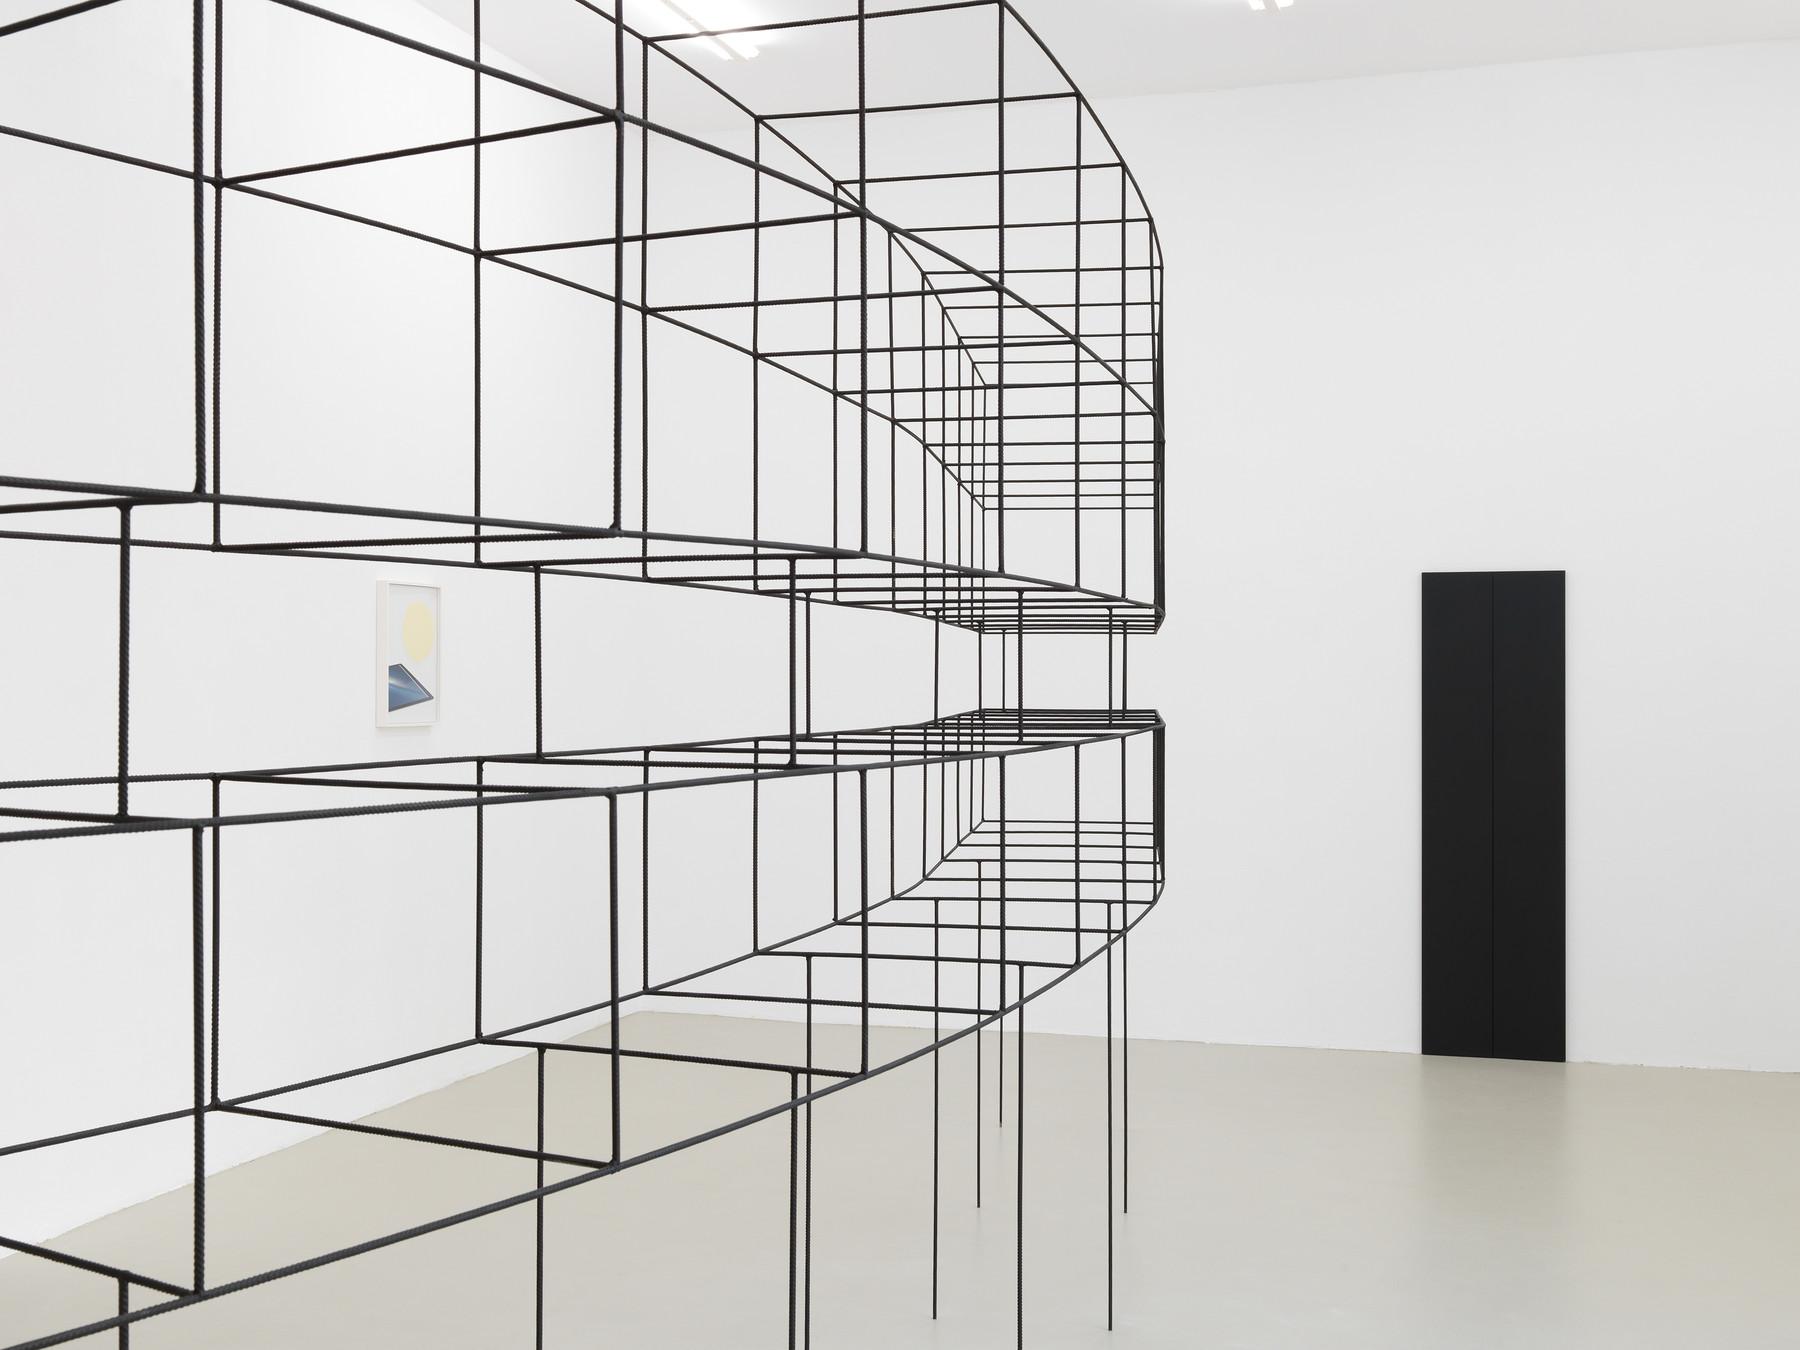 08_Edit Oderbolz_Kunstverein Nürnberg_2017